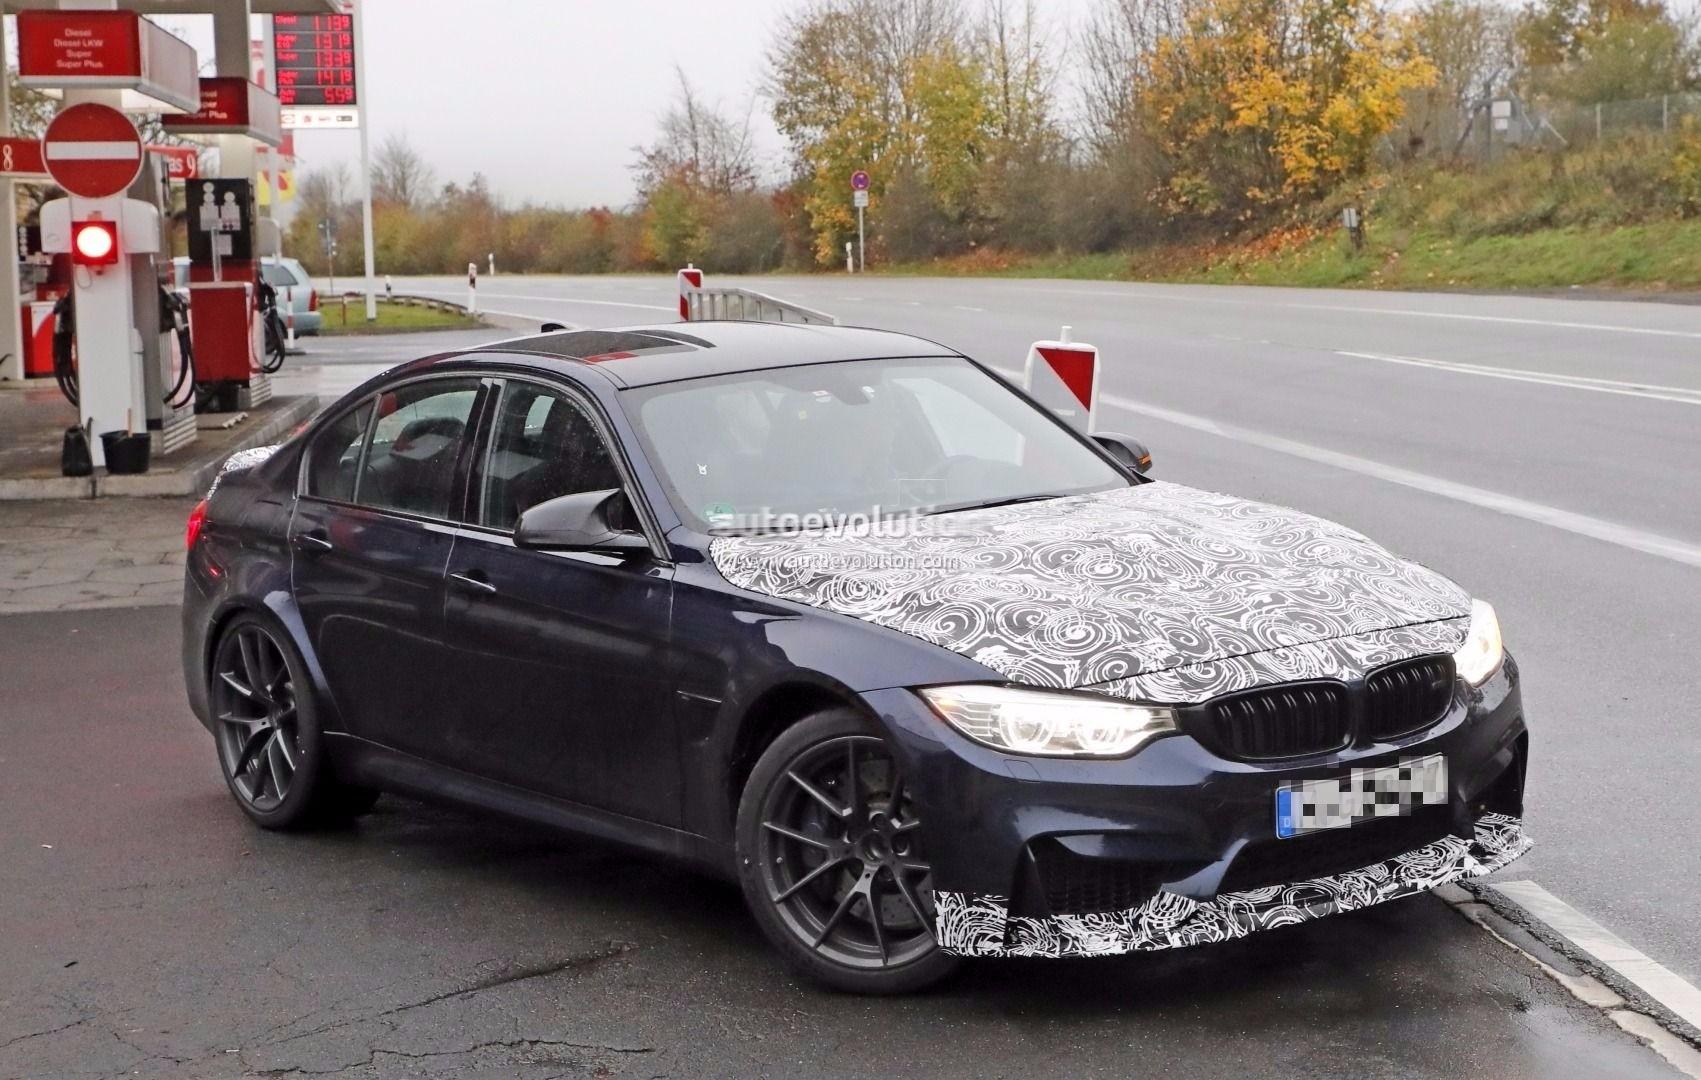 New Bmw X7 2018 >> Spyshots: 2018 BMW M3 CS Spied, Aiming for Nurburgring Sedan Record? - autoevolution